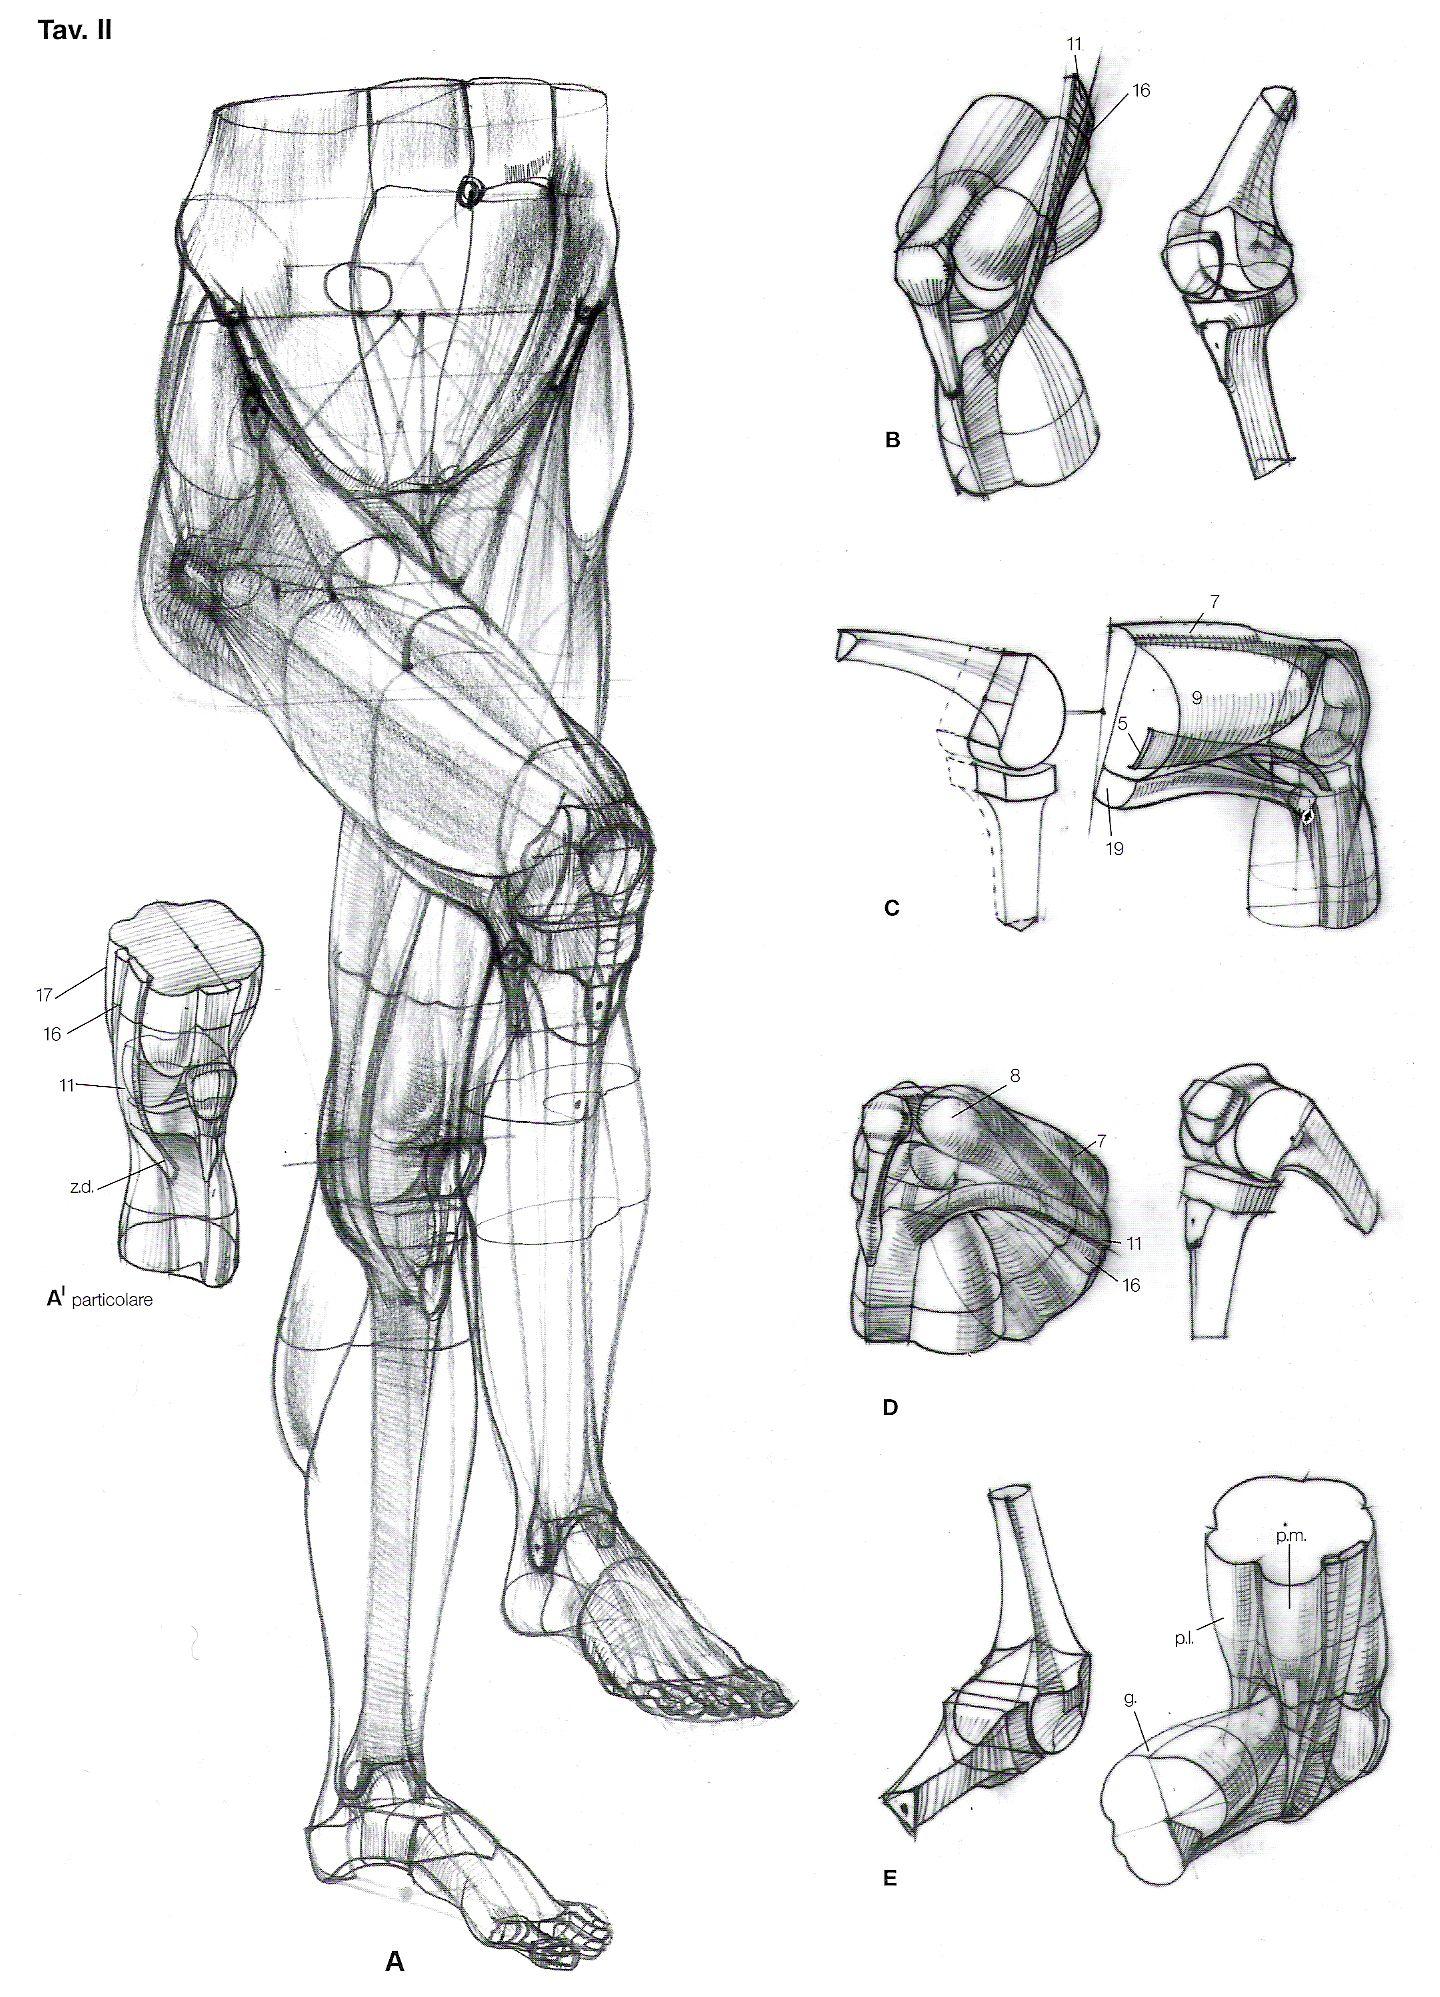 Rodilla | FIGURA HUMANA | Pinterest | Anatomía, Dibujo y Figuras humanas